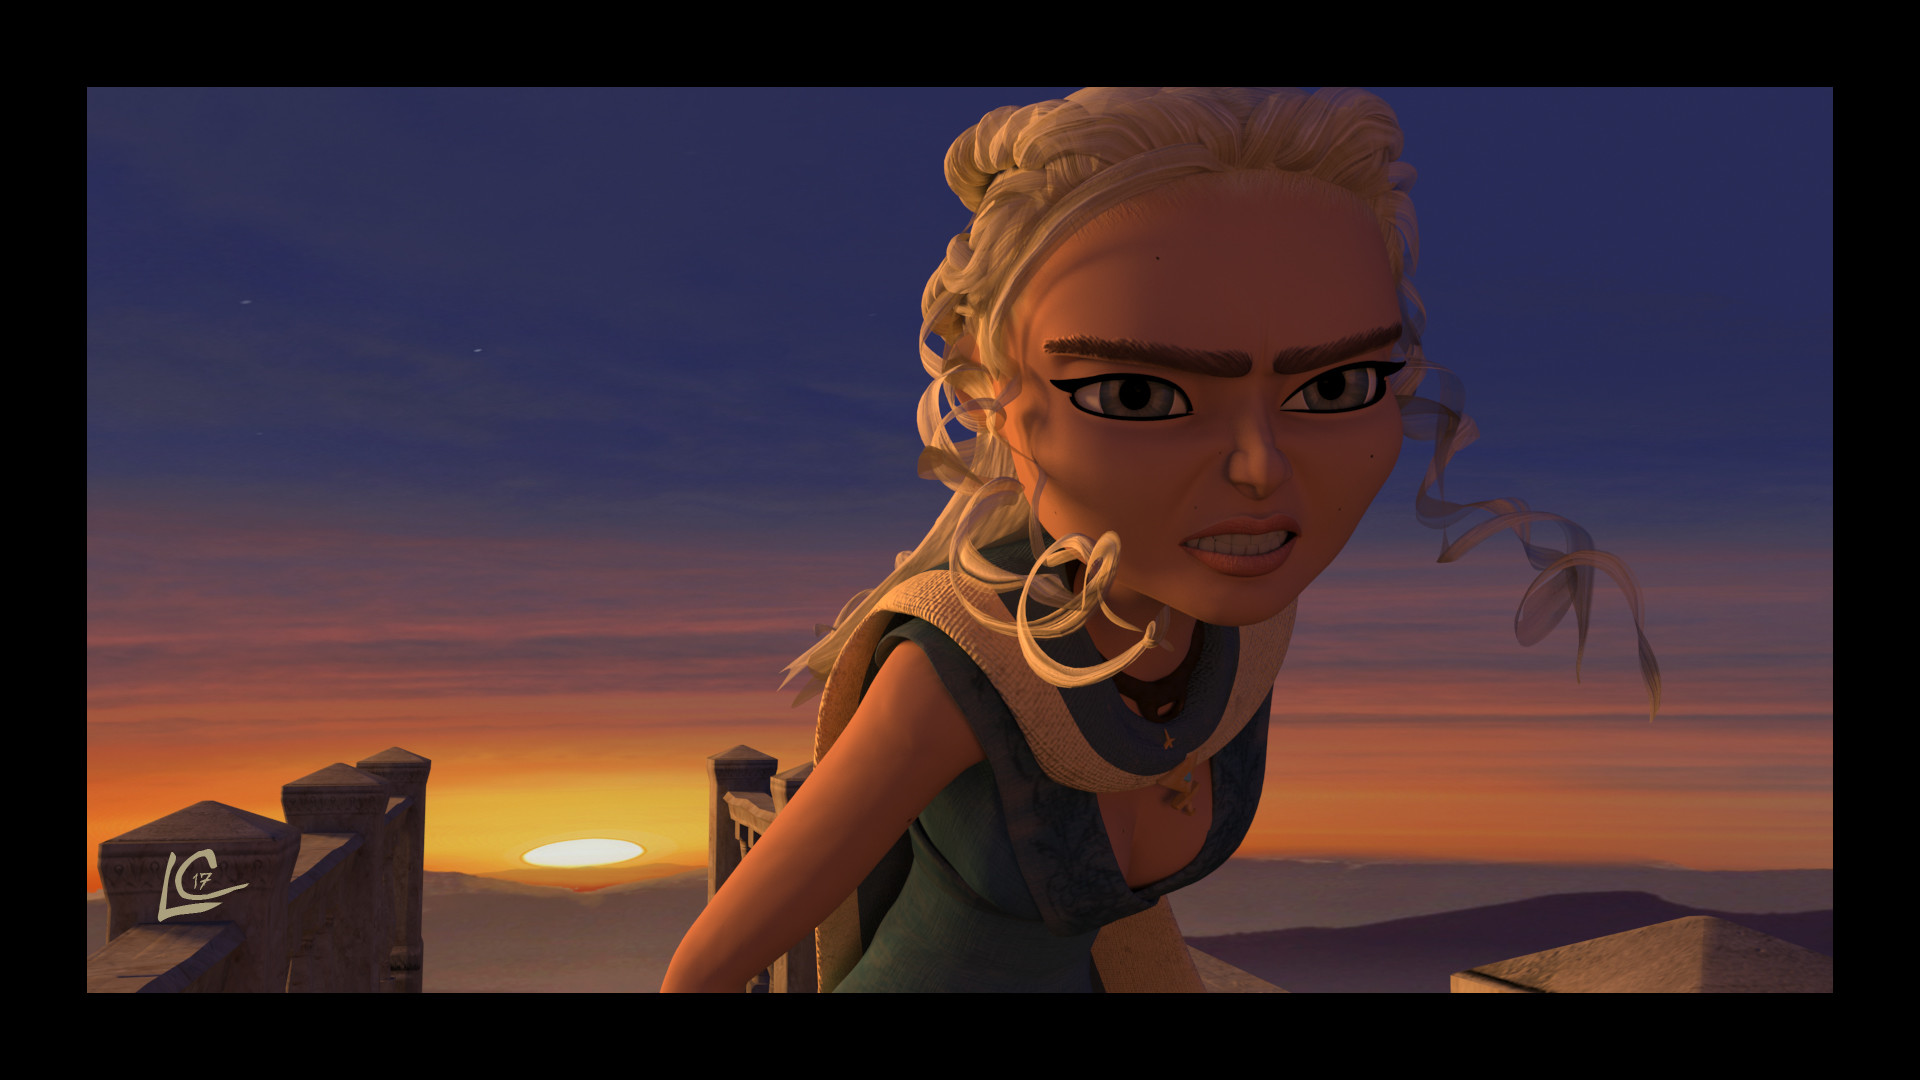 Last chac daenerys plan04 0285